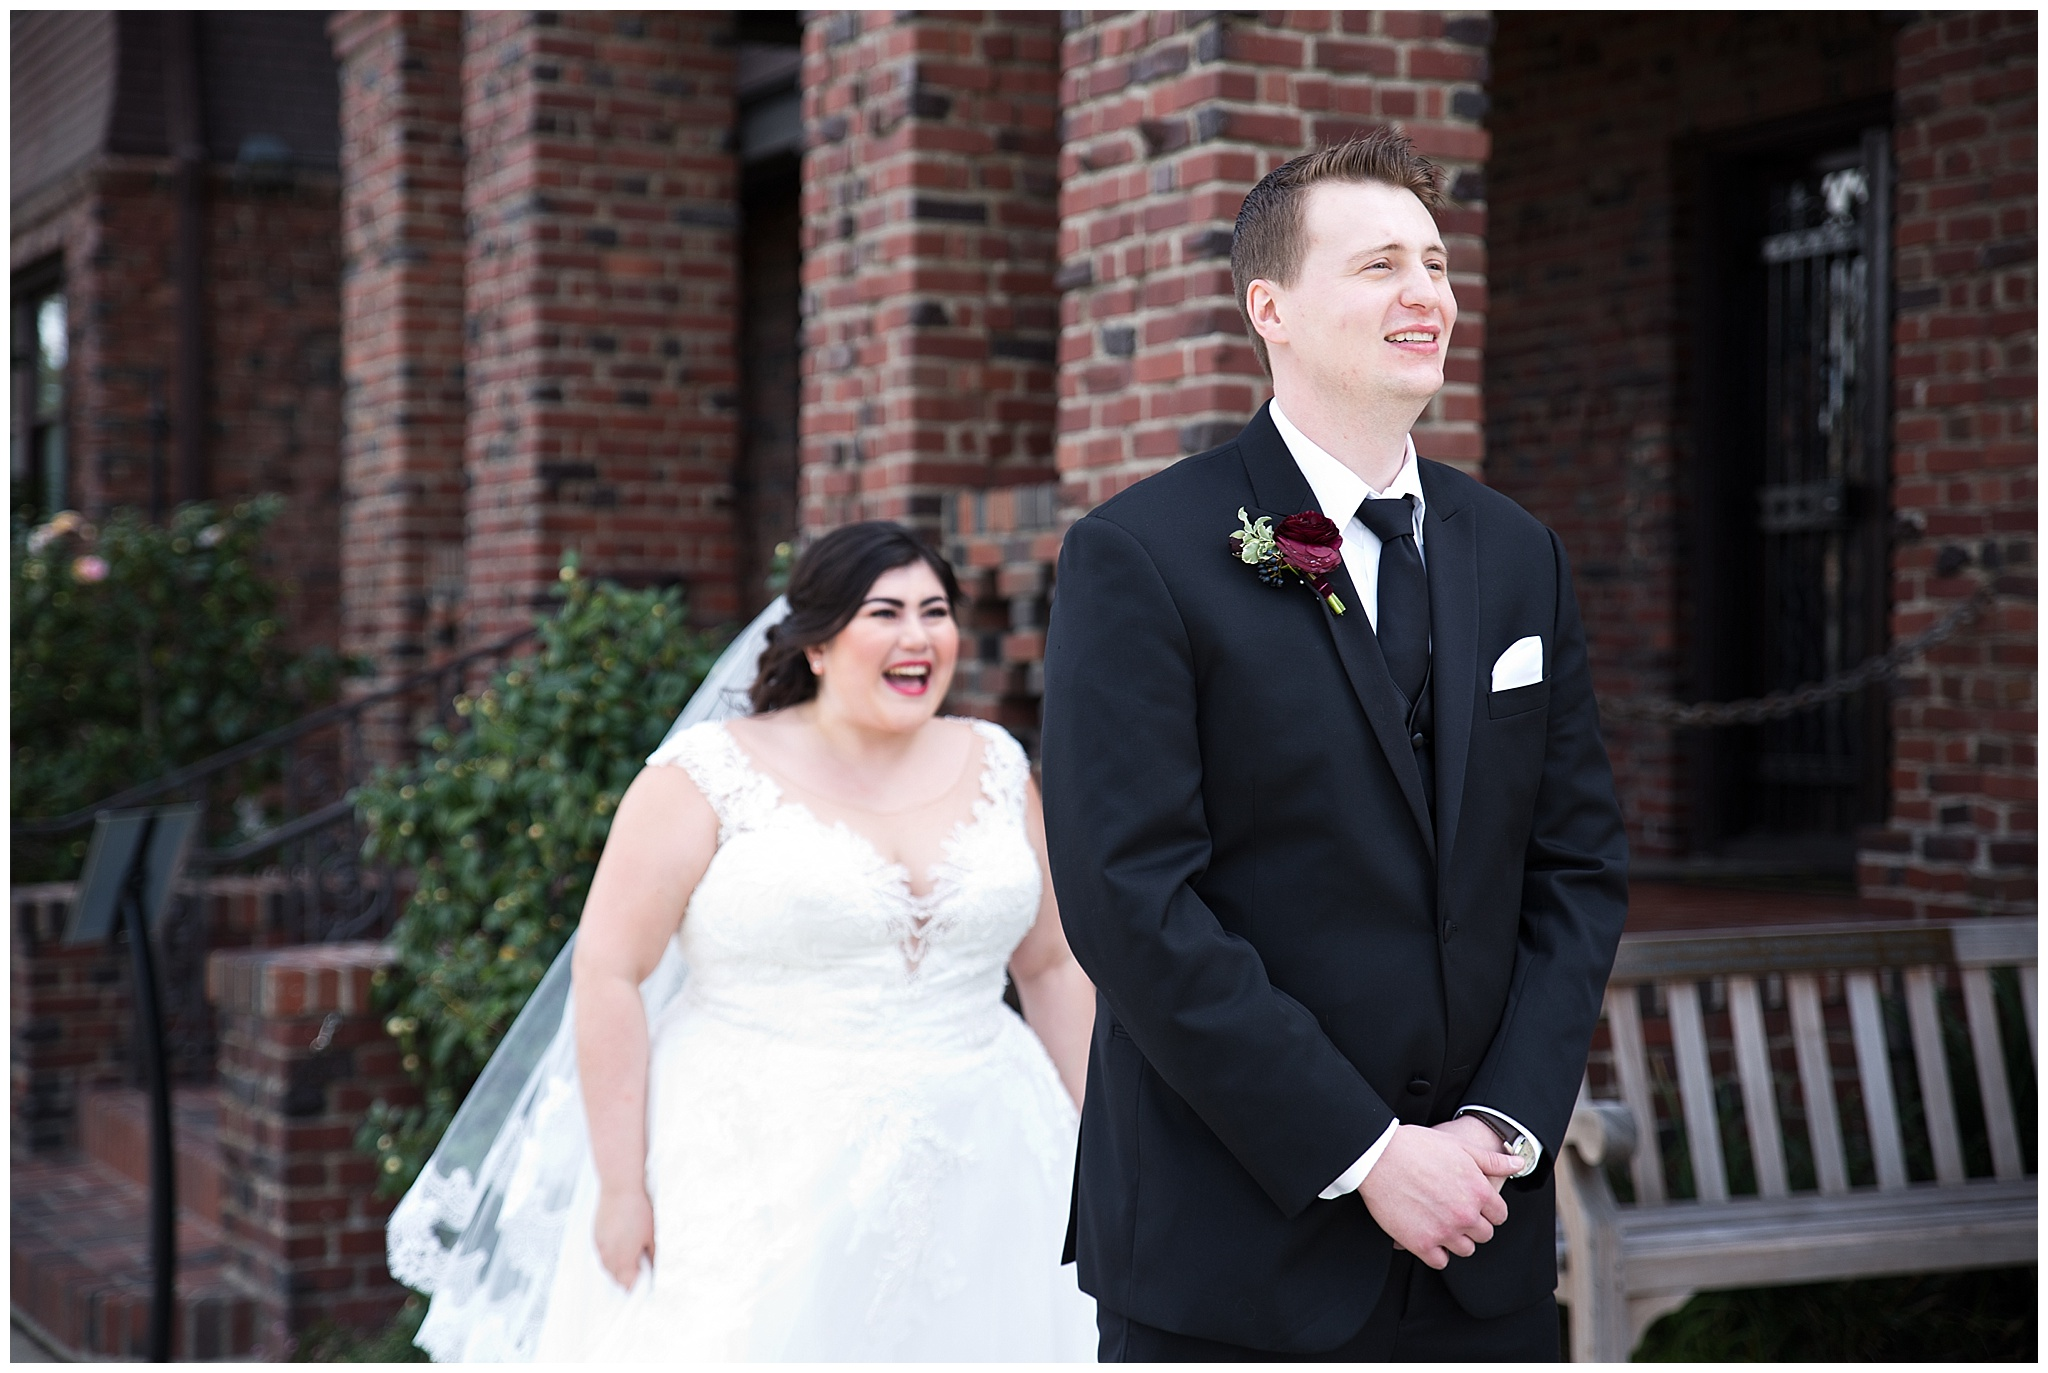 Carol_and_Grant_Wedding_3-3-18-7738.jpg